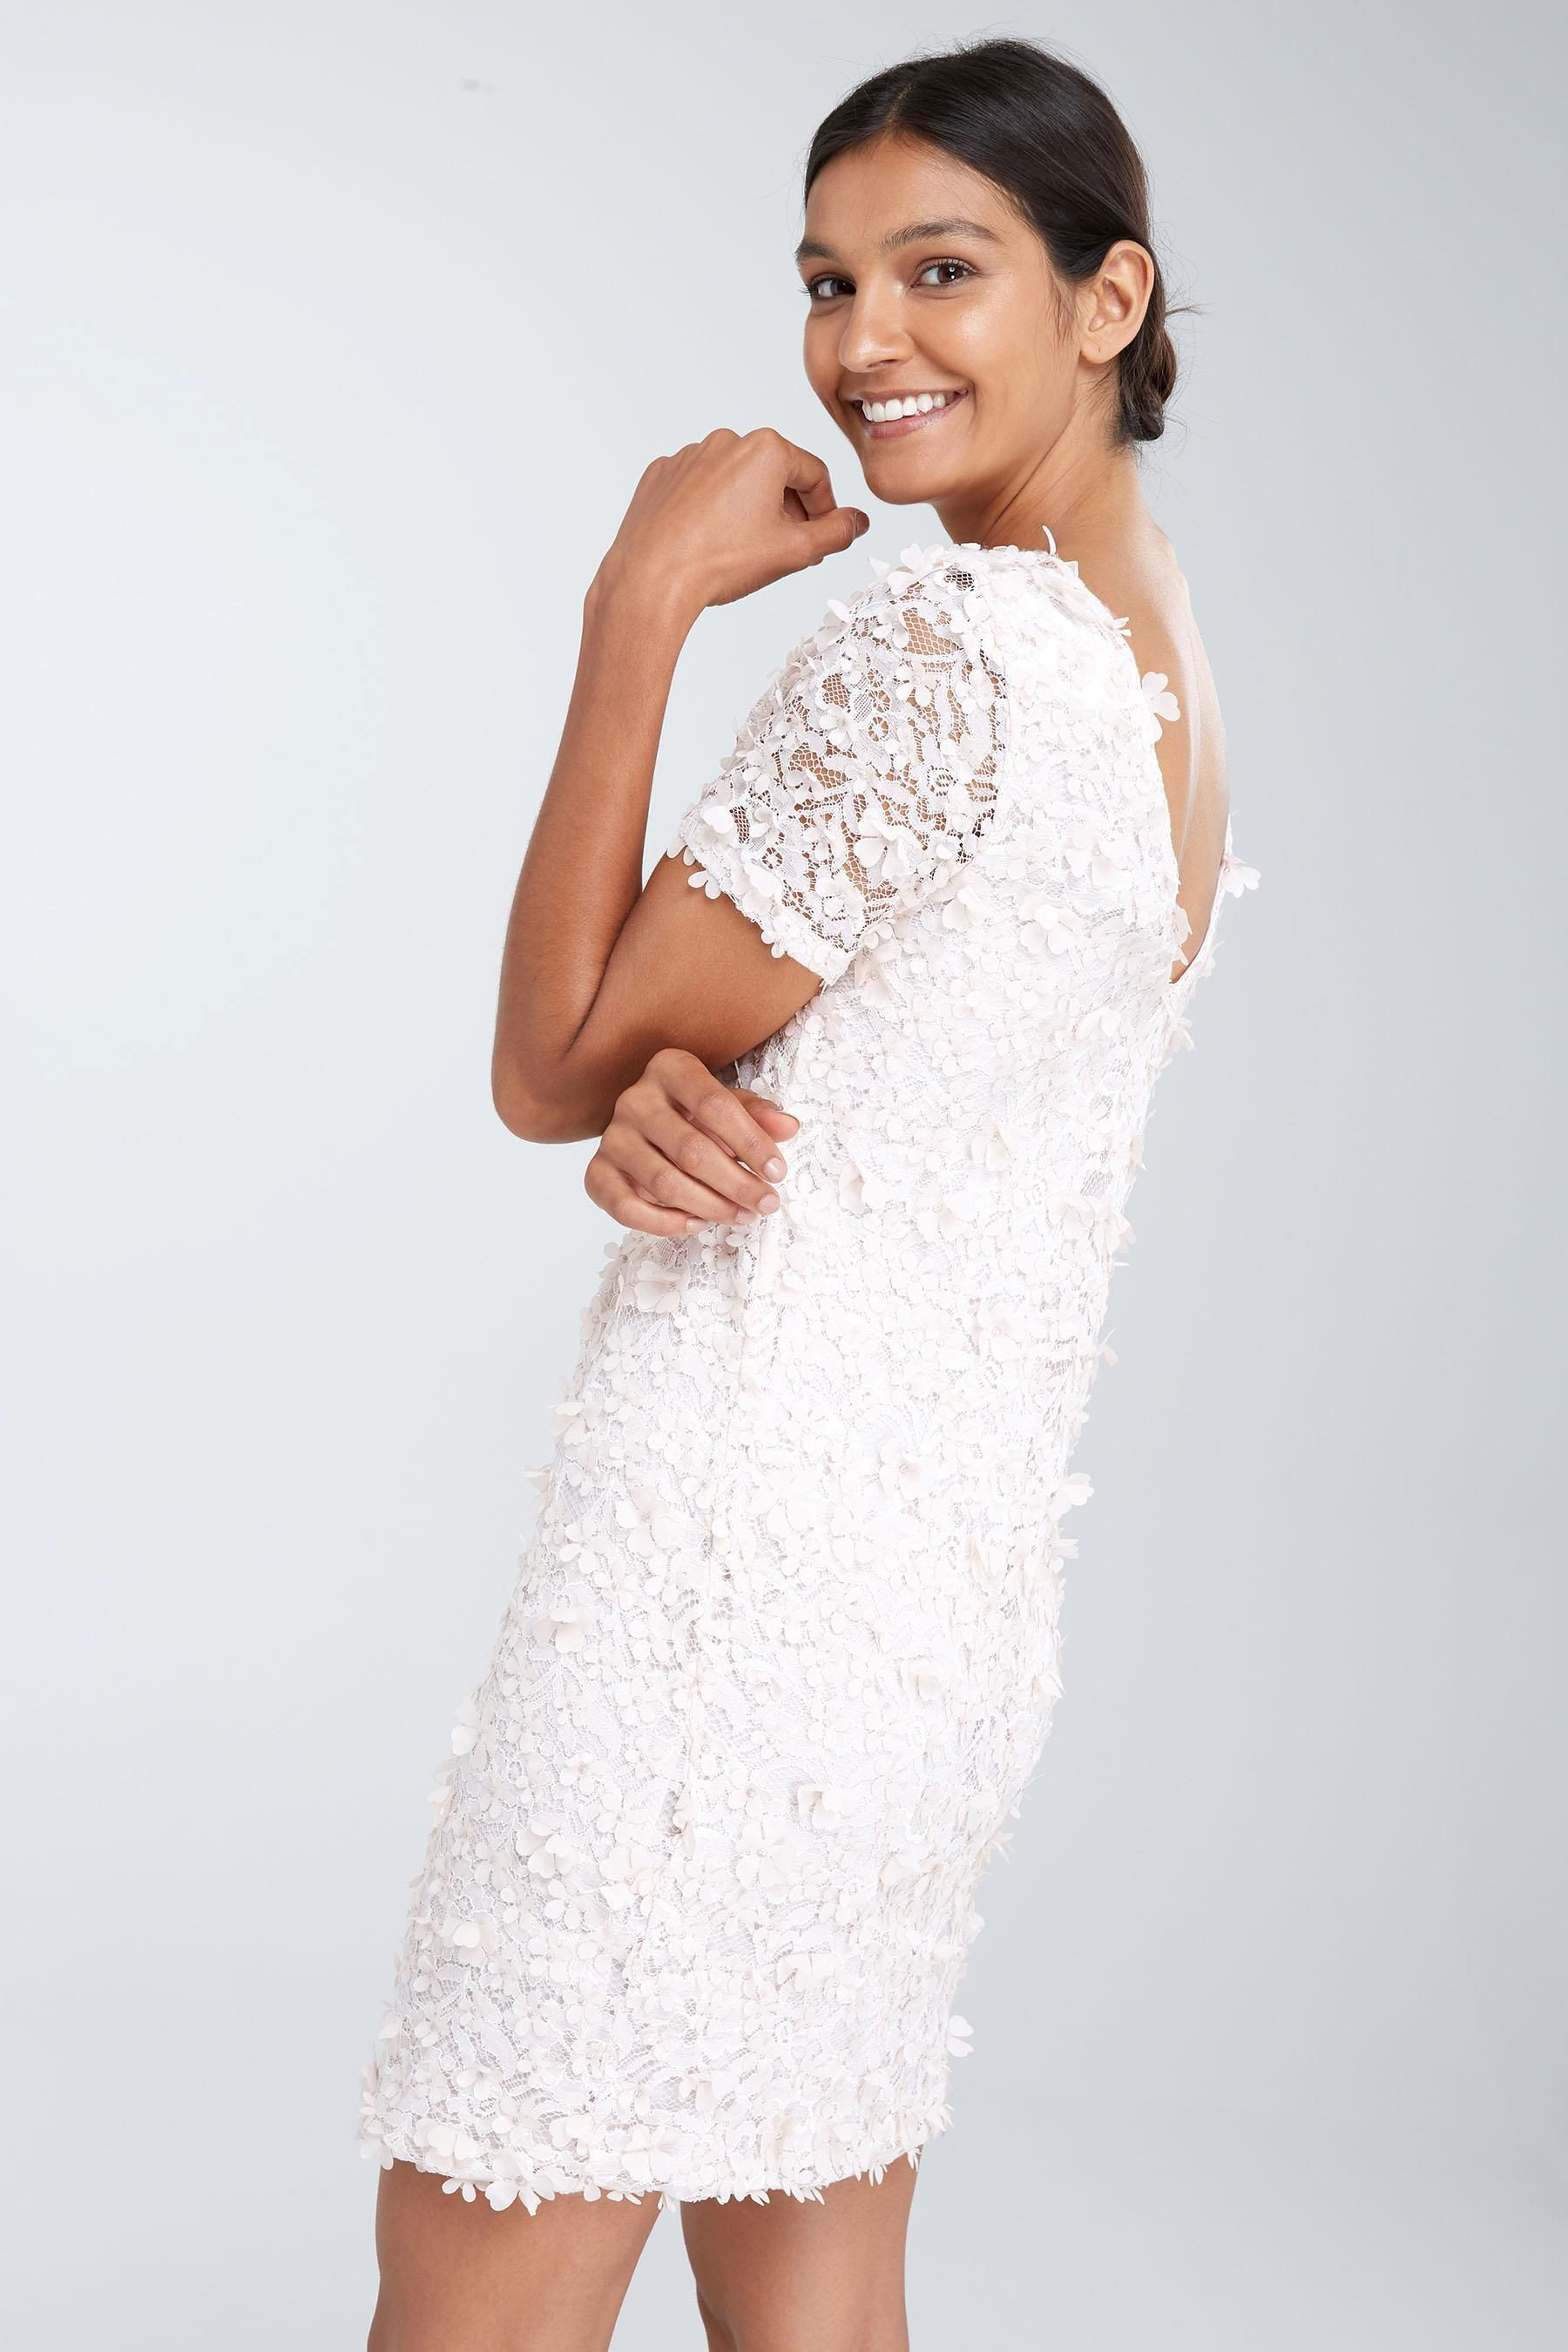 cde8e9a38761 Womens Dresses | Party, Occasion & Evening Dresses Spirit Clothing,  Christmas Trends, Party